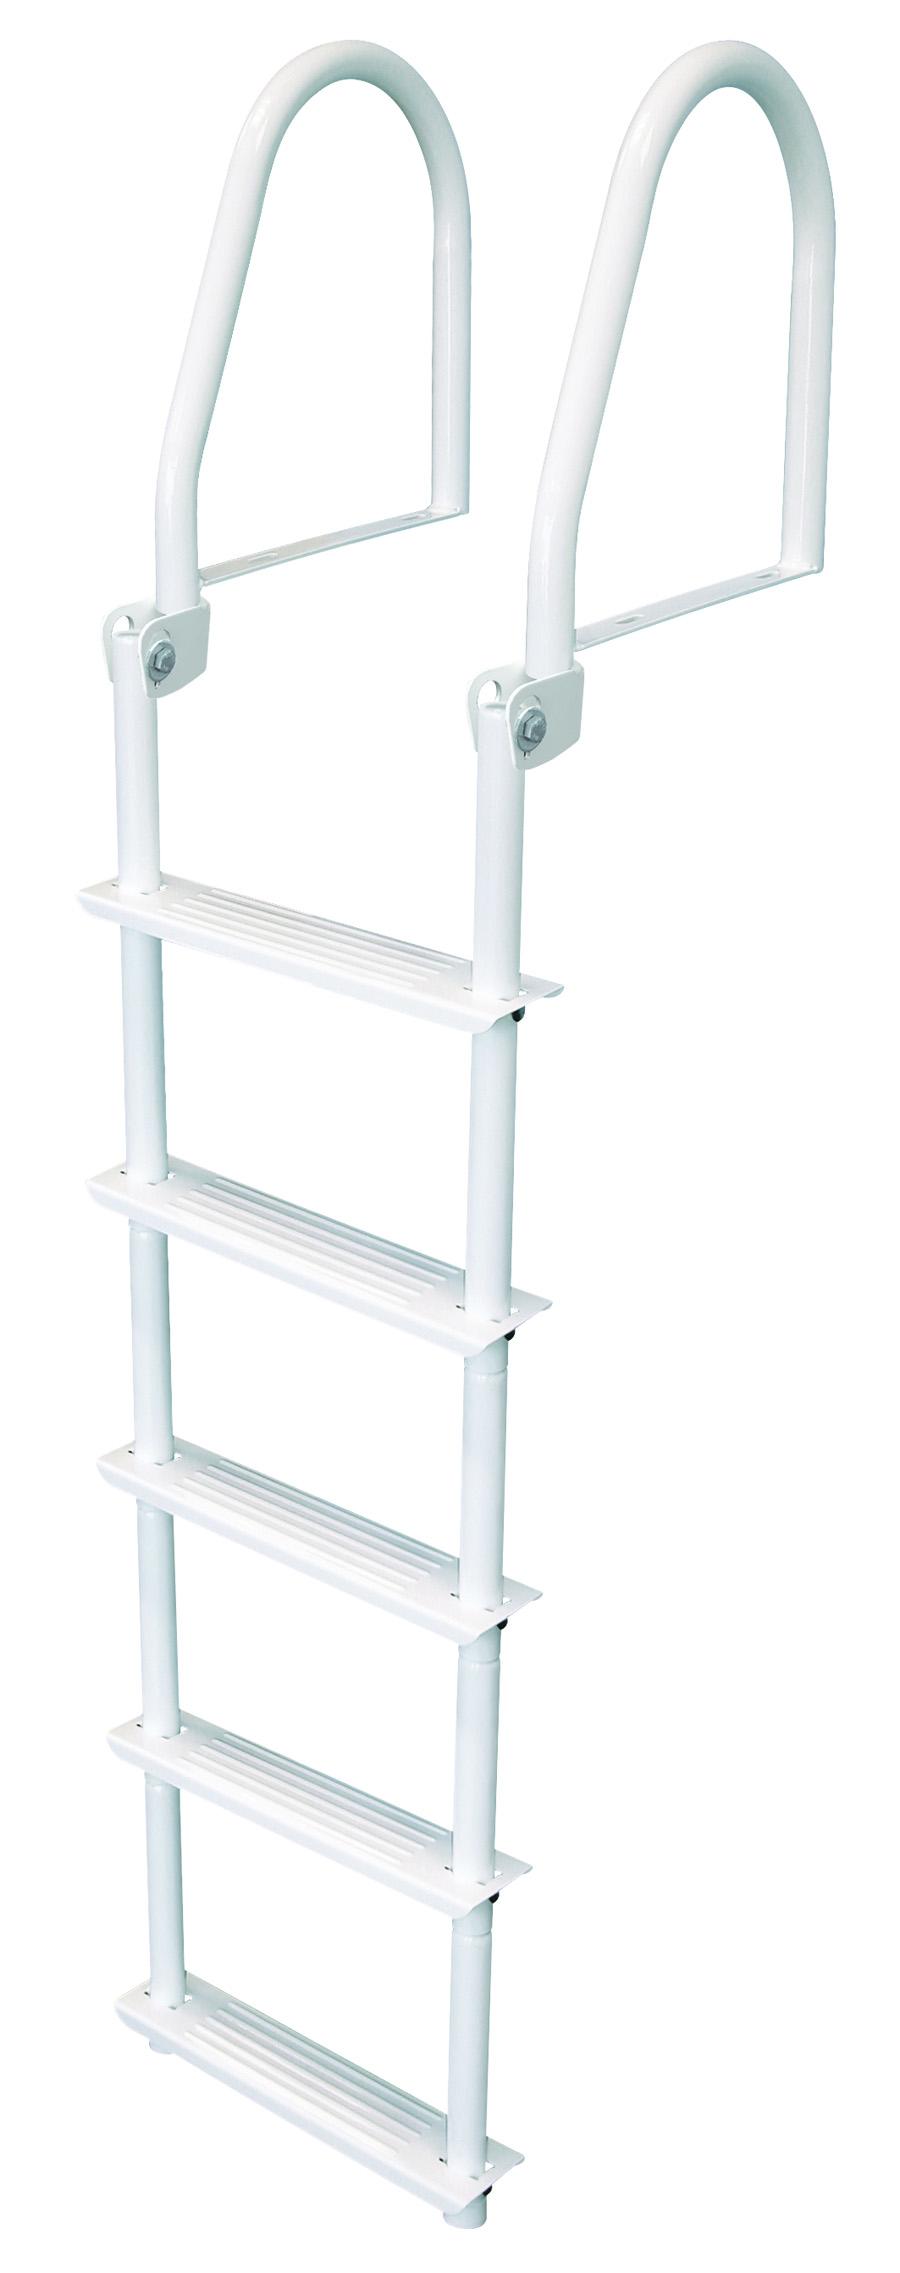 Jif Marine Flip Up Dock Ladder 3 5 Step Ladder With